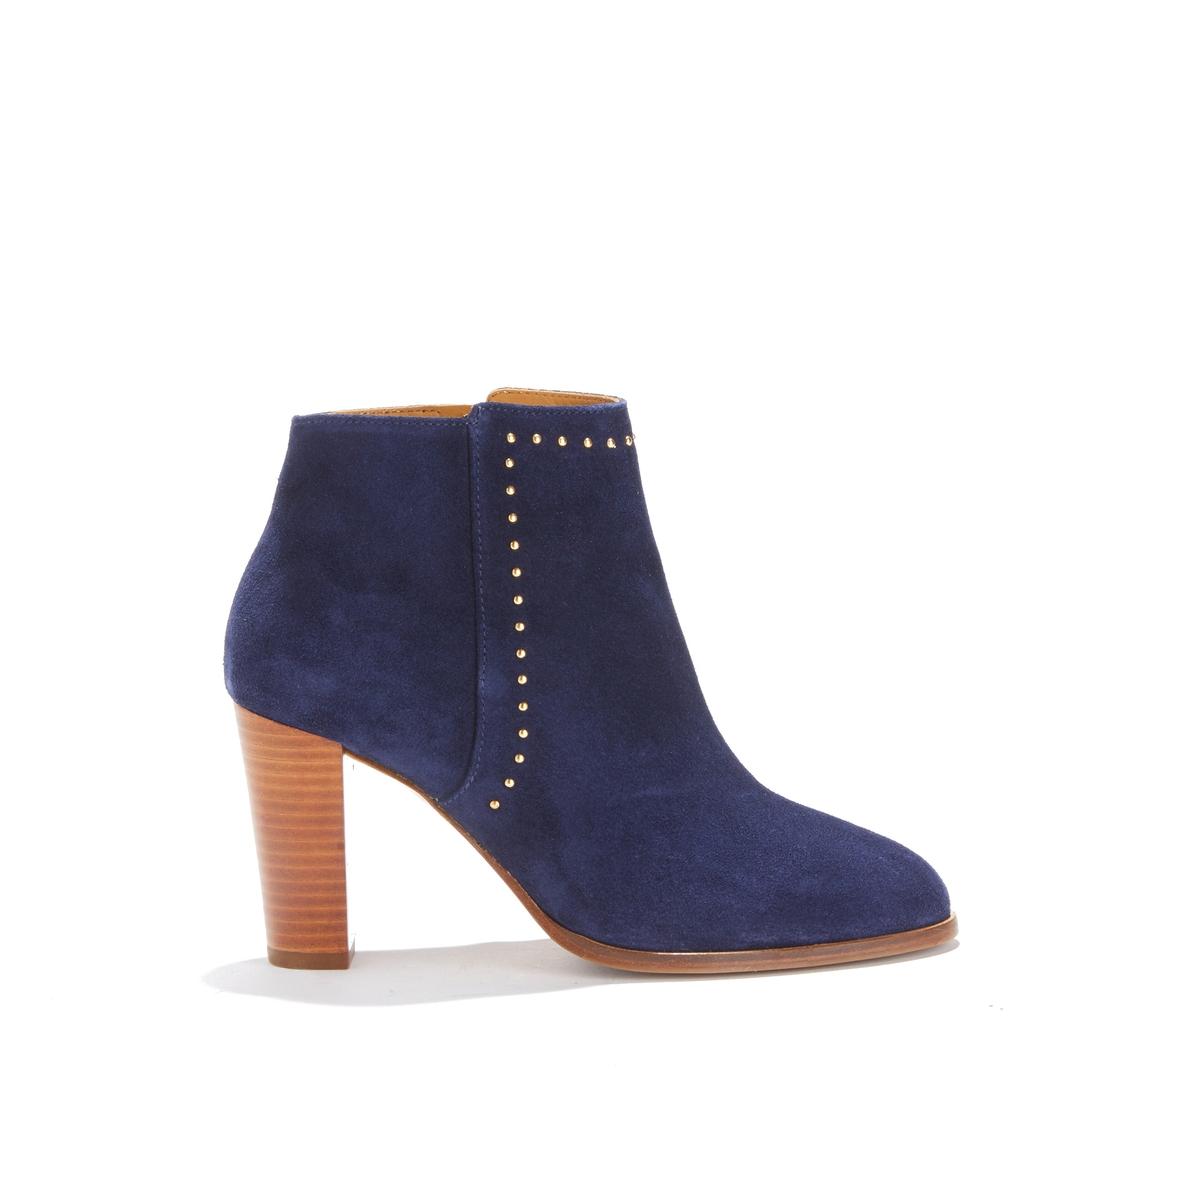 Ботильоны кожаные на высоком каблуке L'ENVOÛTANTE цены онлайн